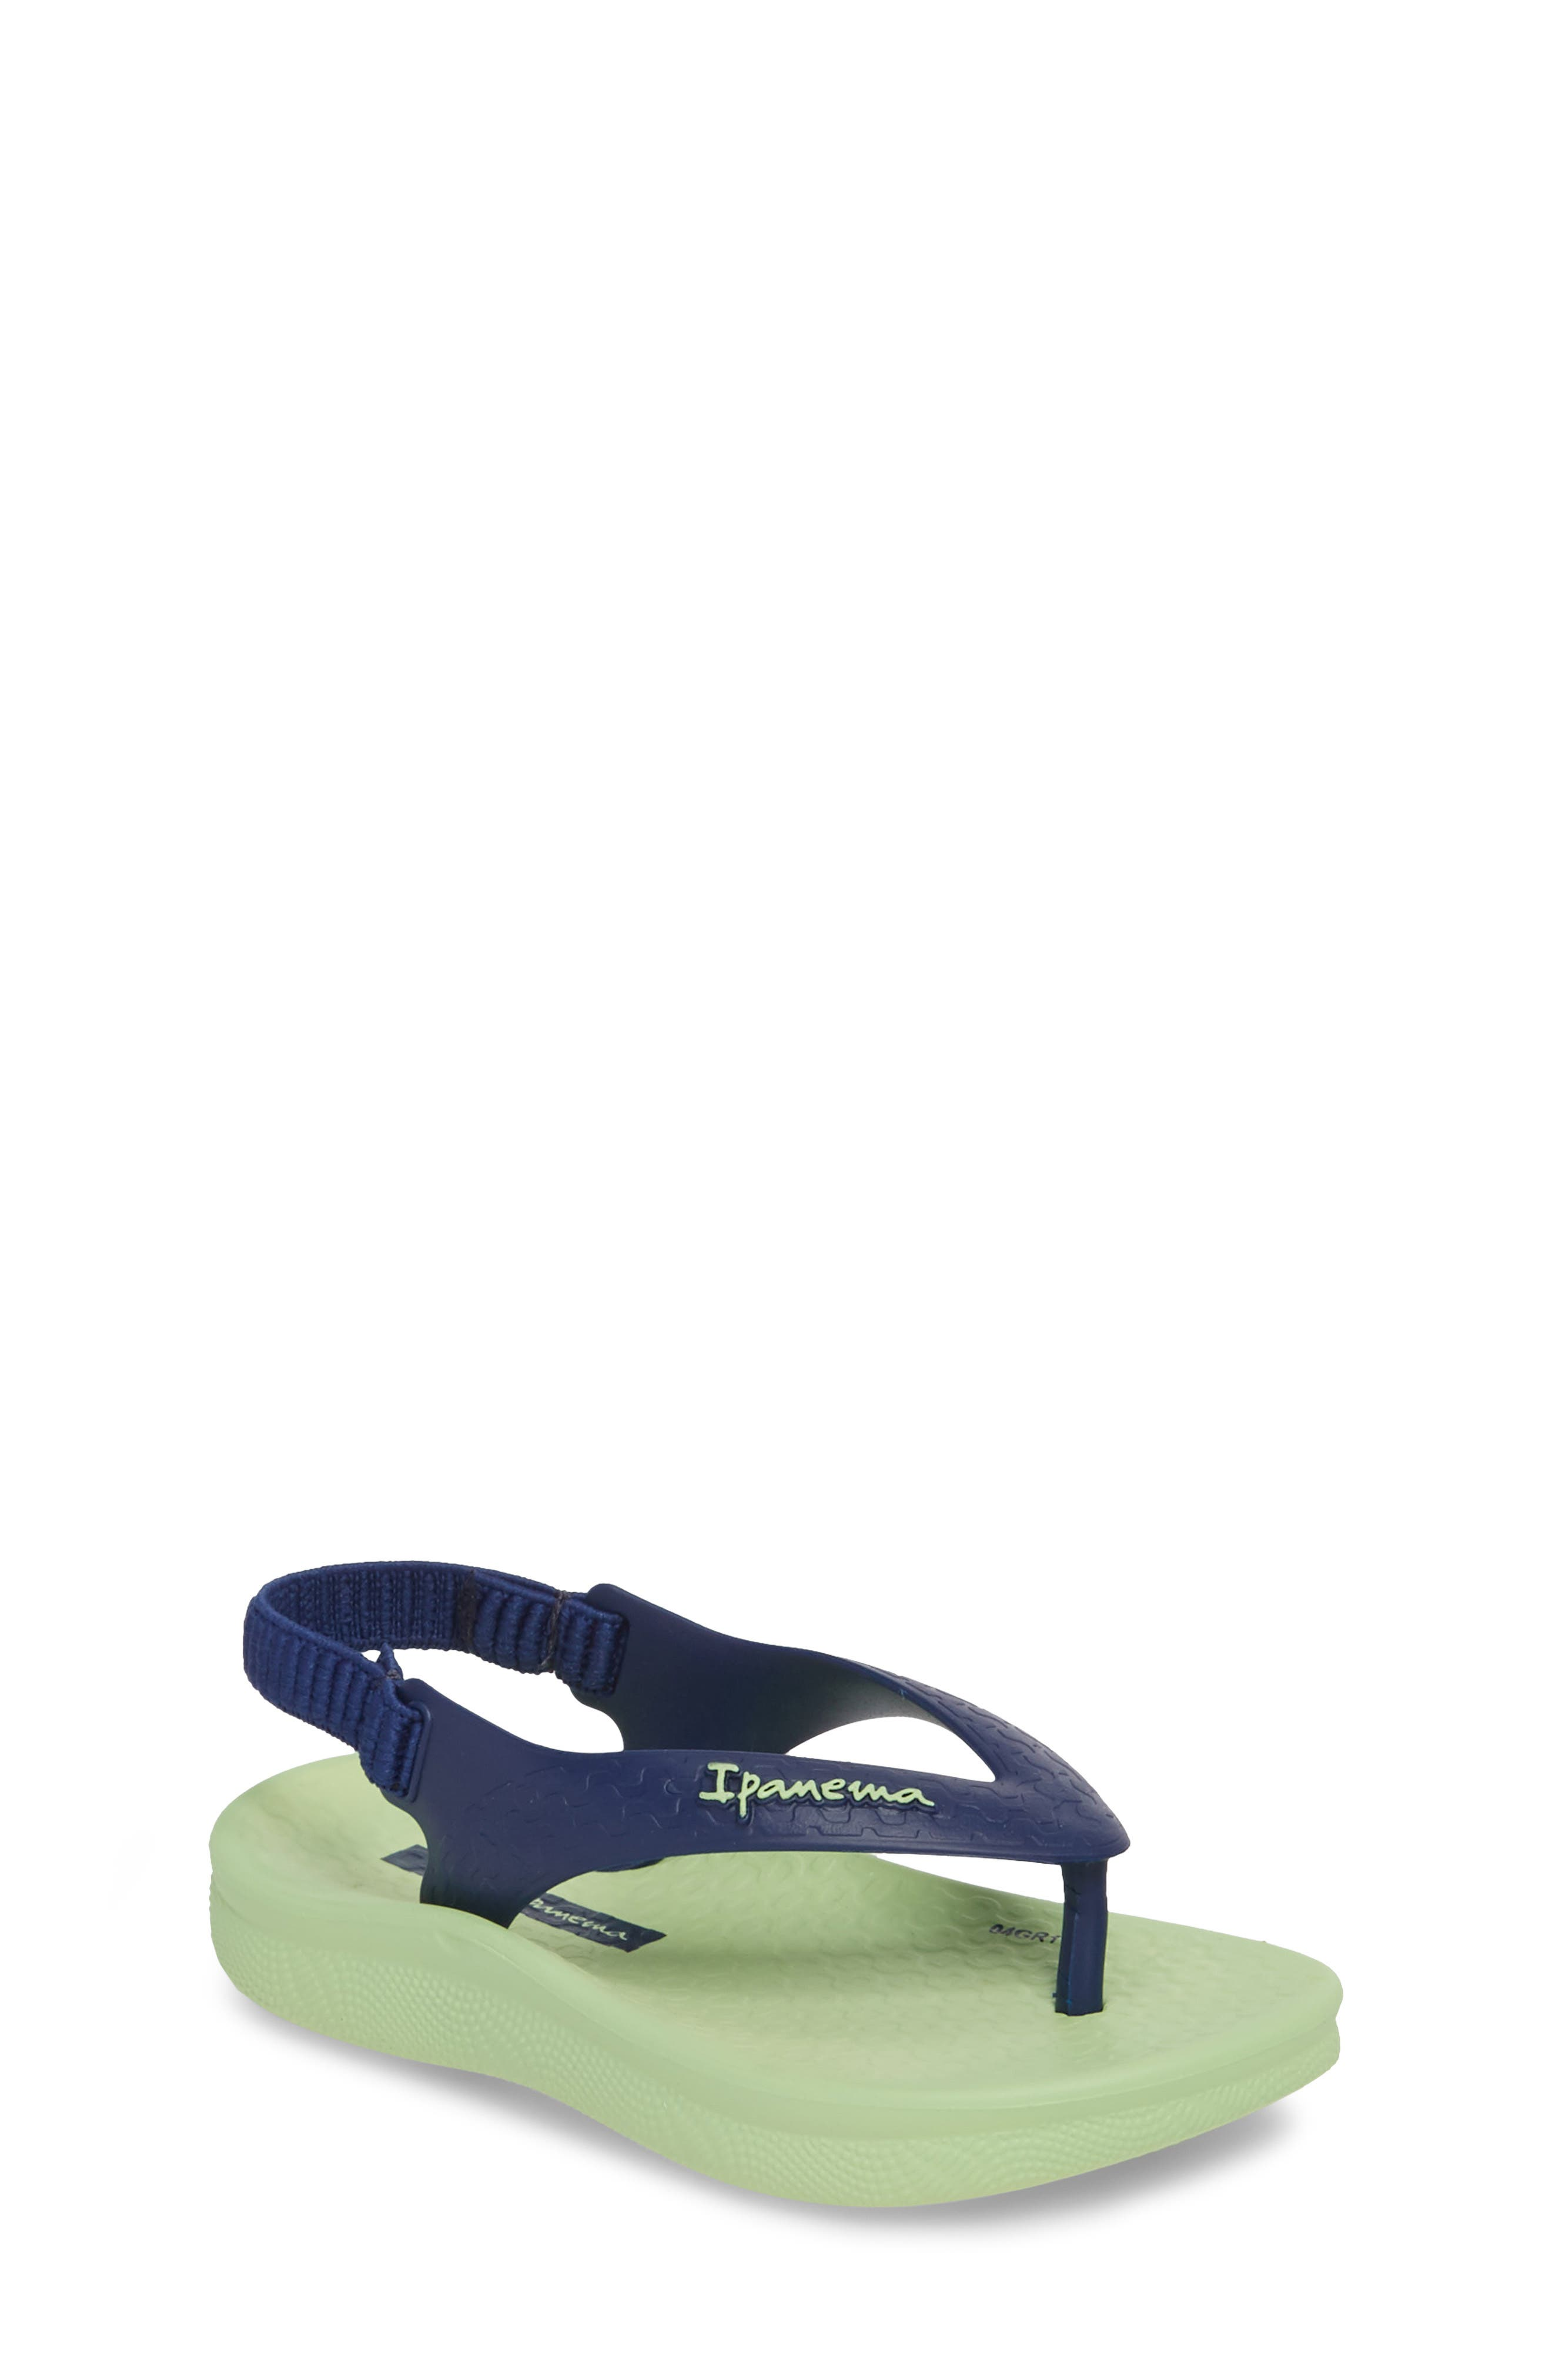 Ana Tan Flip Flop,                         Main,                         color,